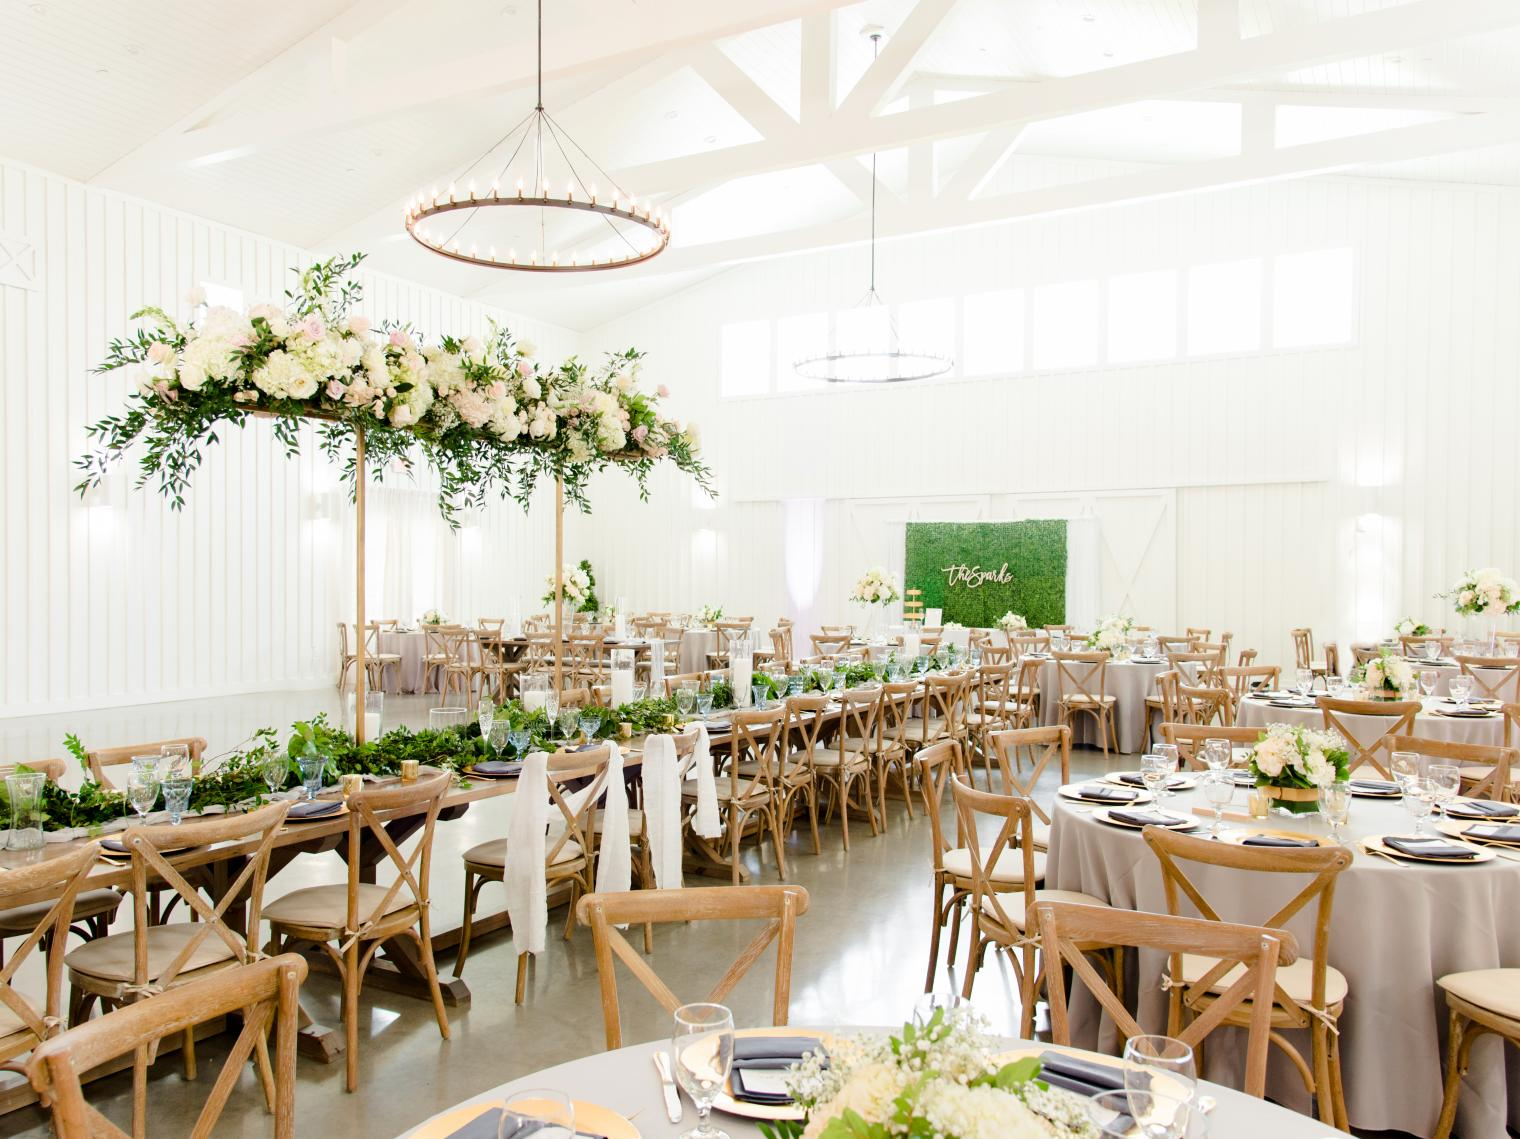 Top Wedding Venues in Houston, Texas